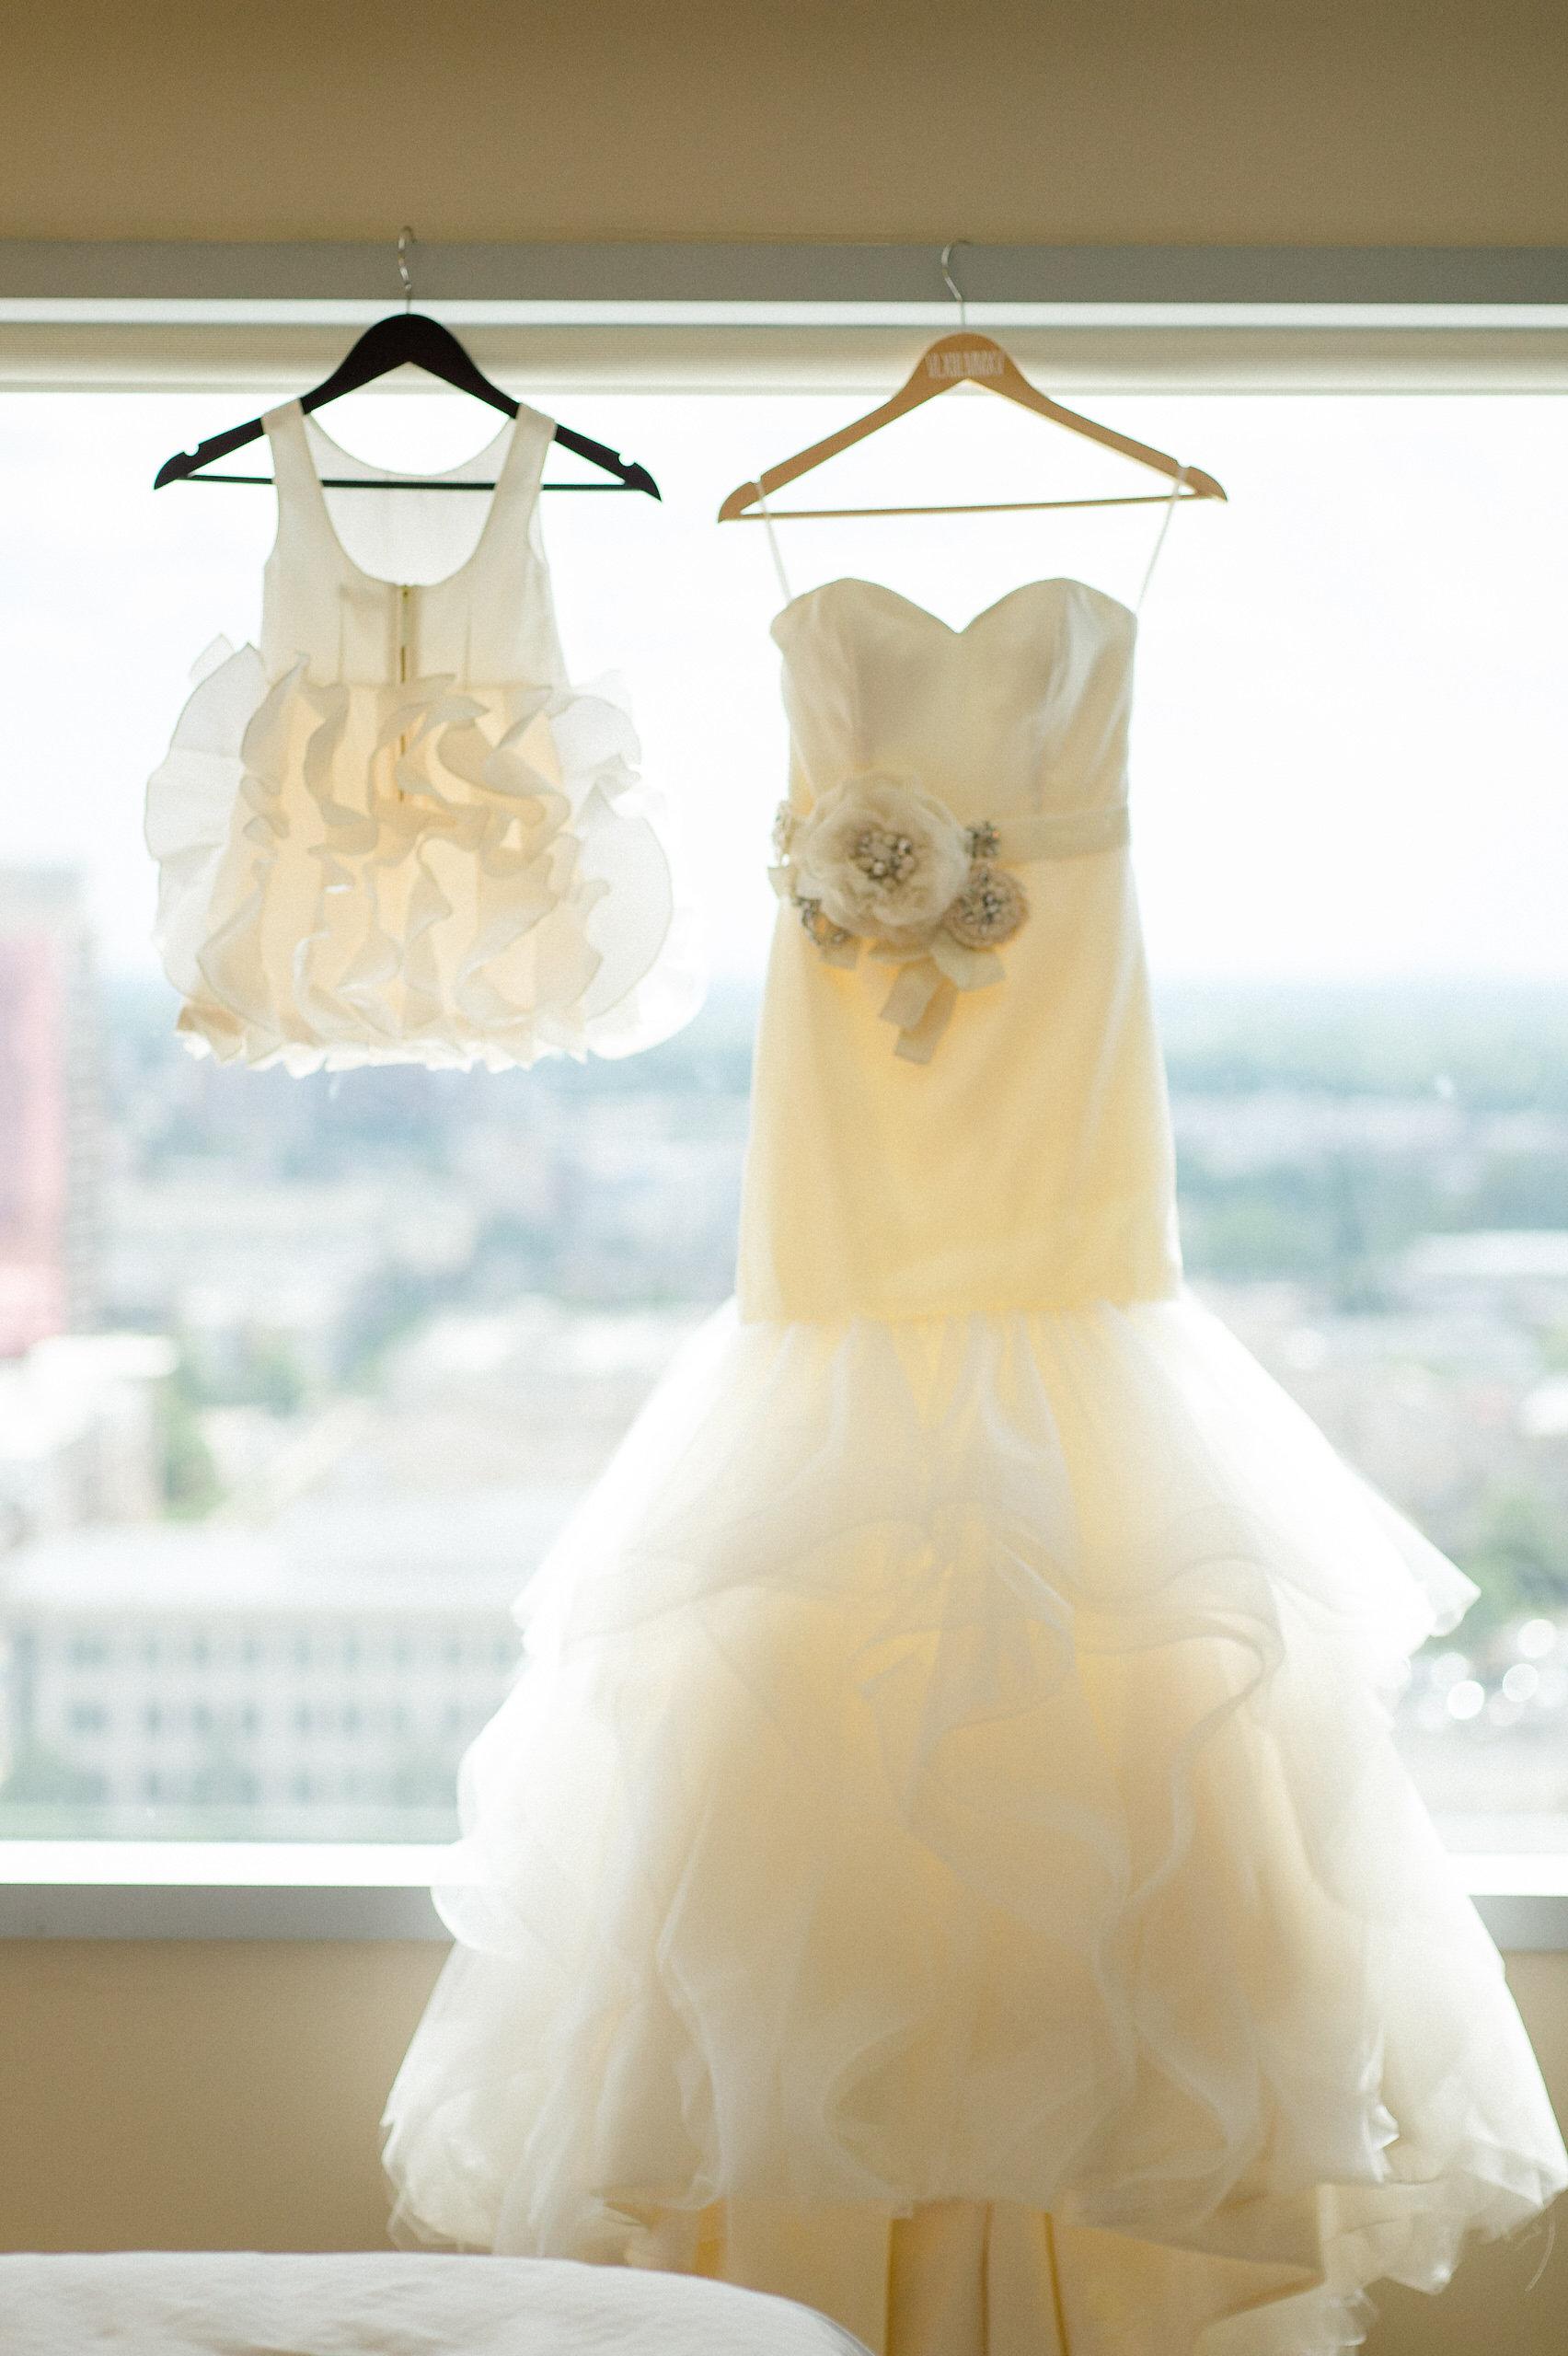 shelby&jordan|smitten&hooked|wedding|details-033.jpg